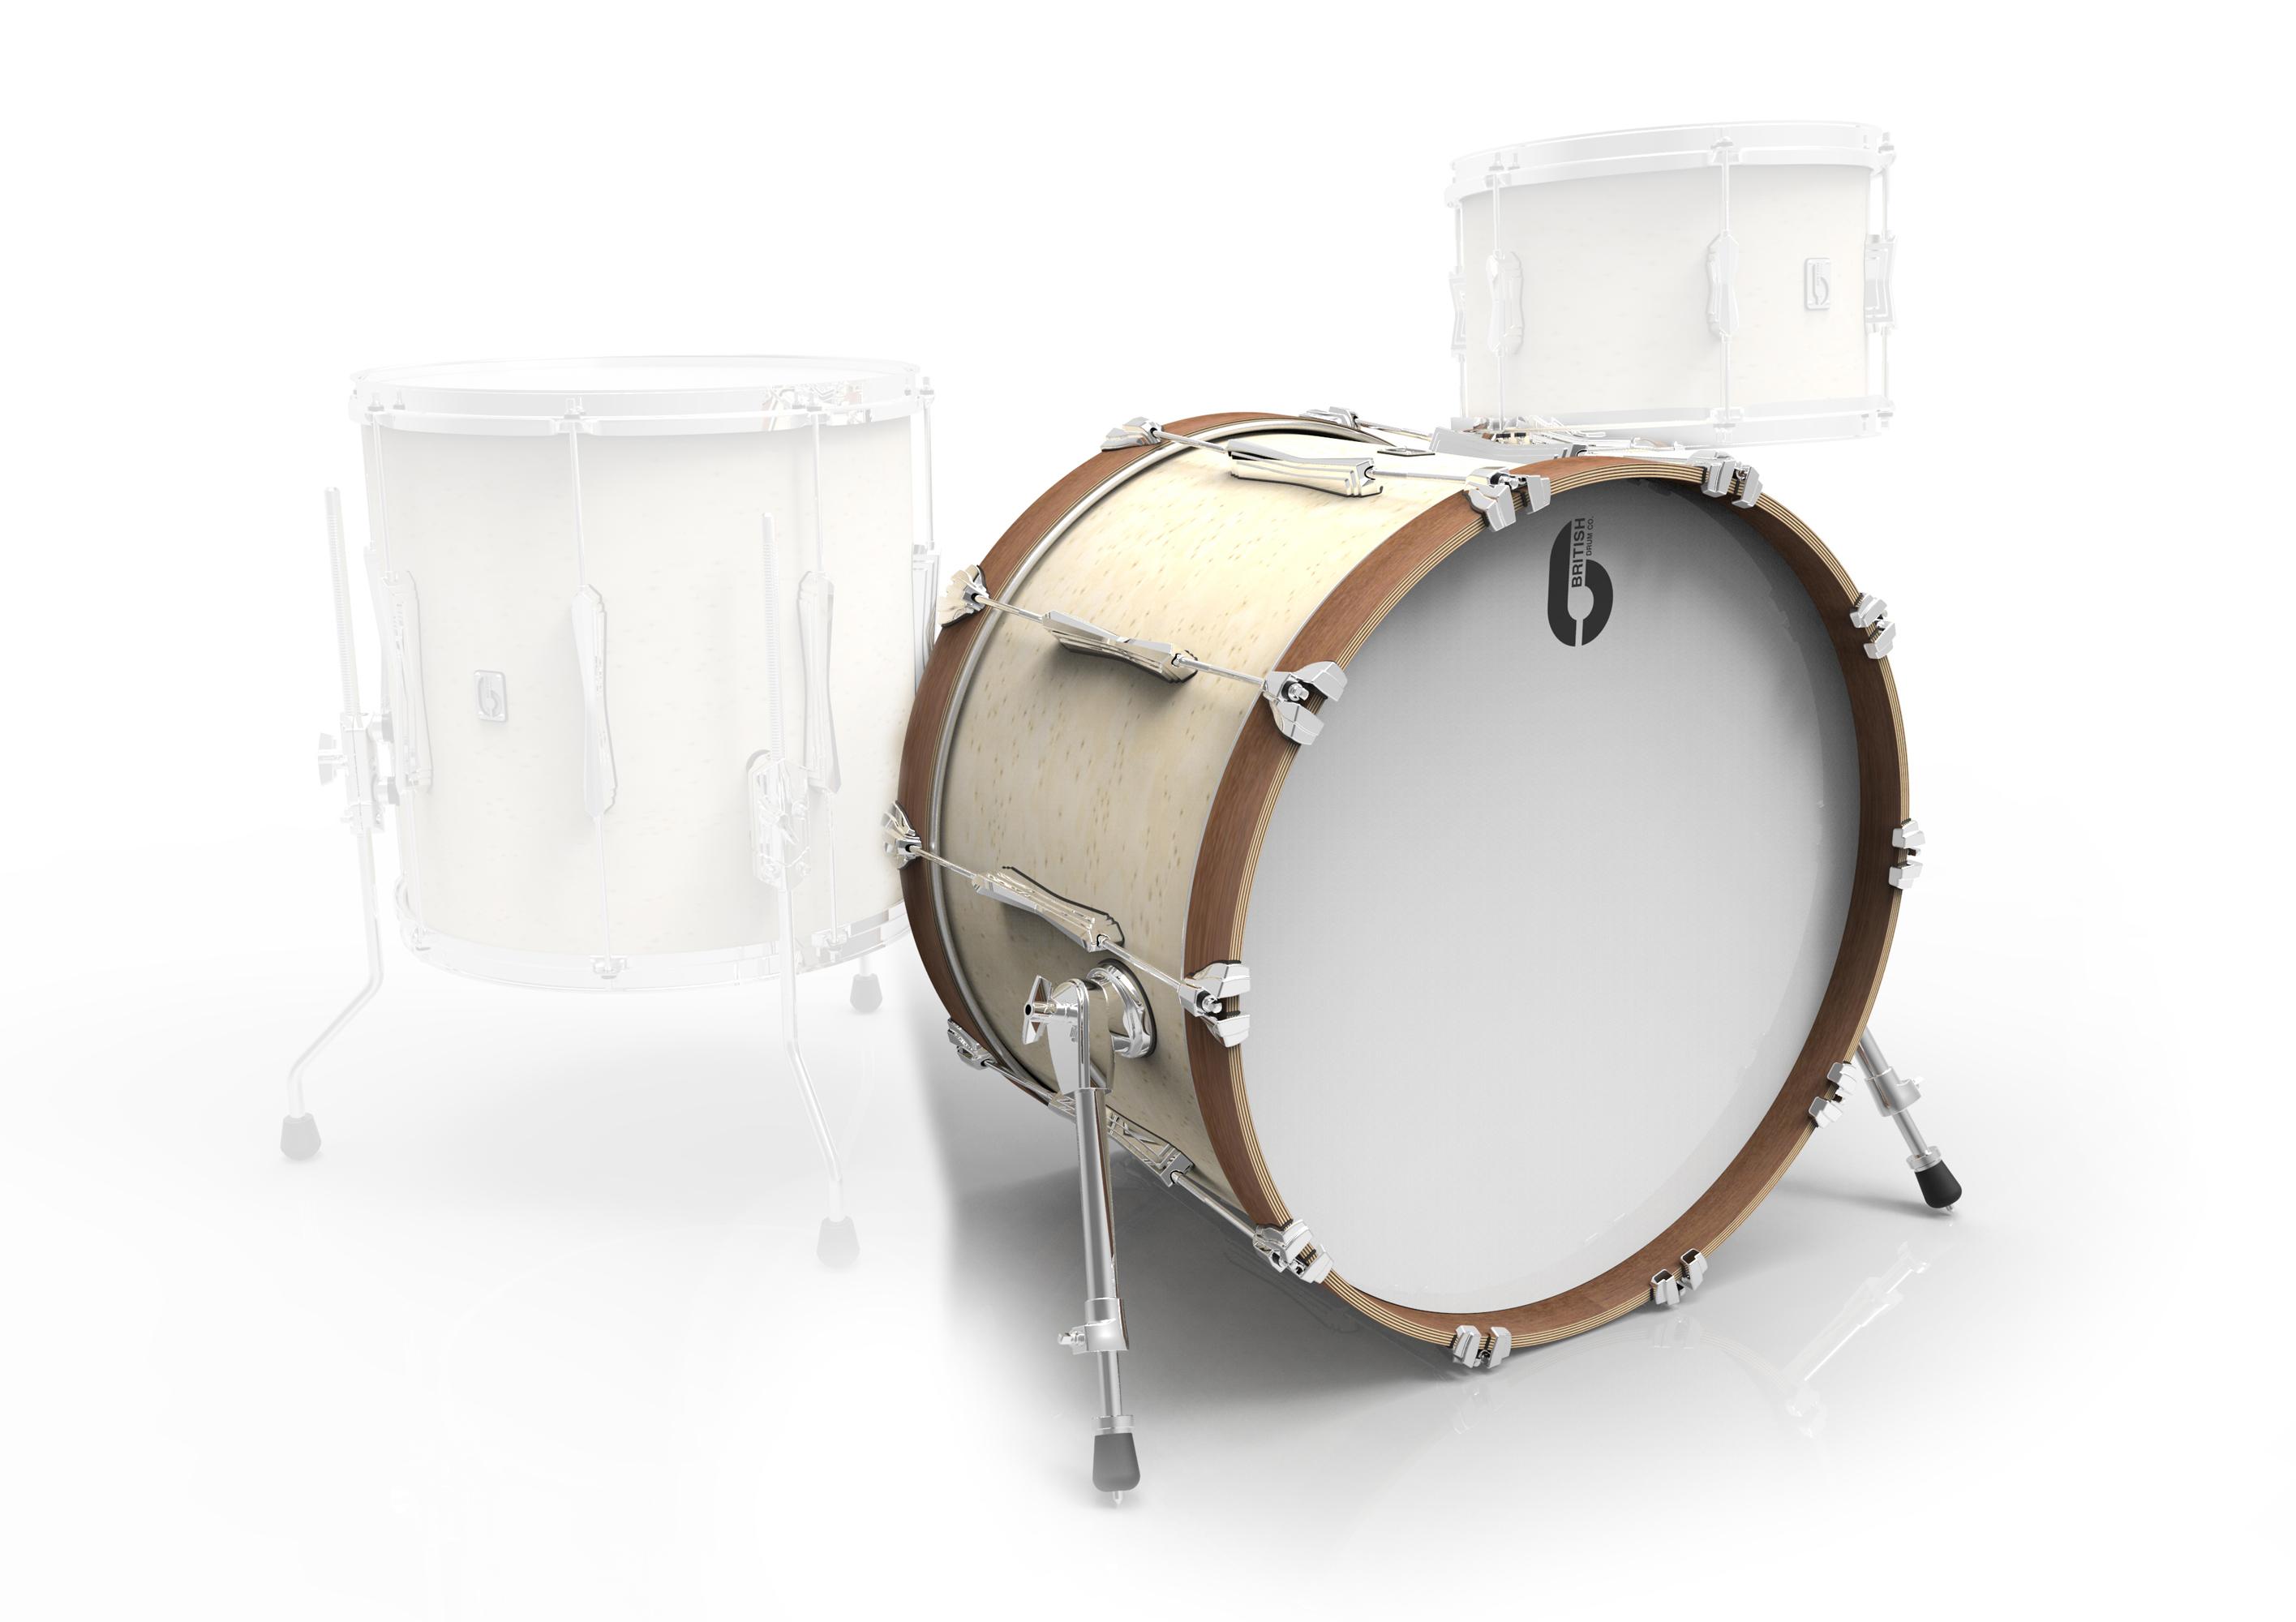 BDC Lounge Bass Drum 18x 14